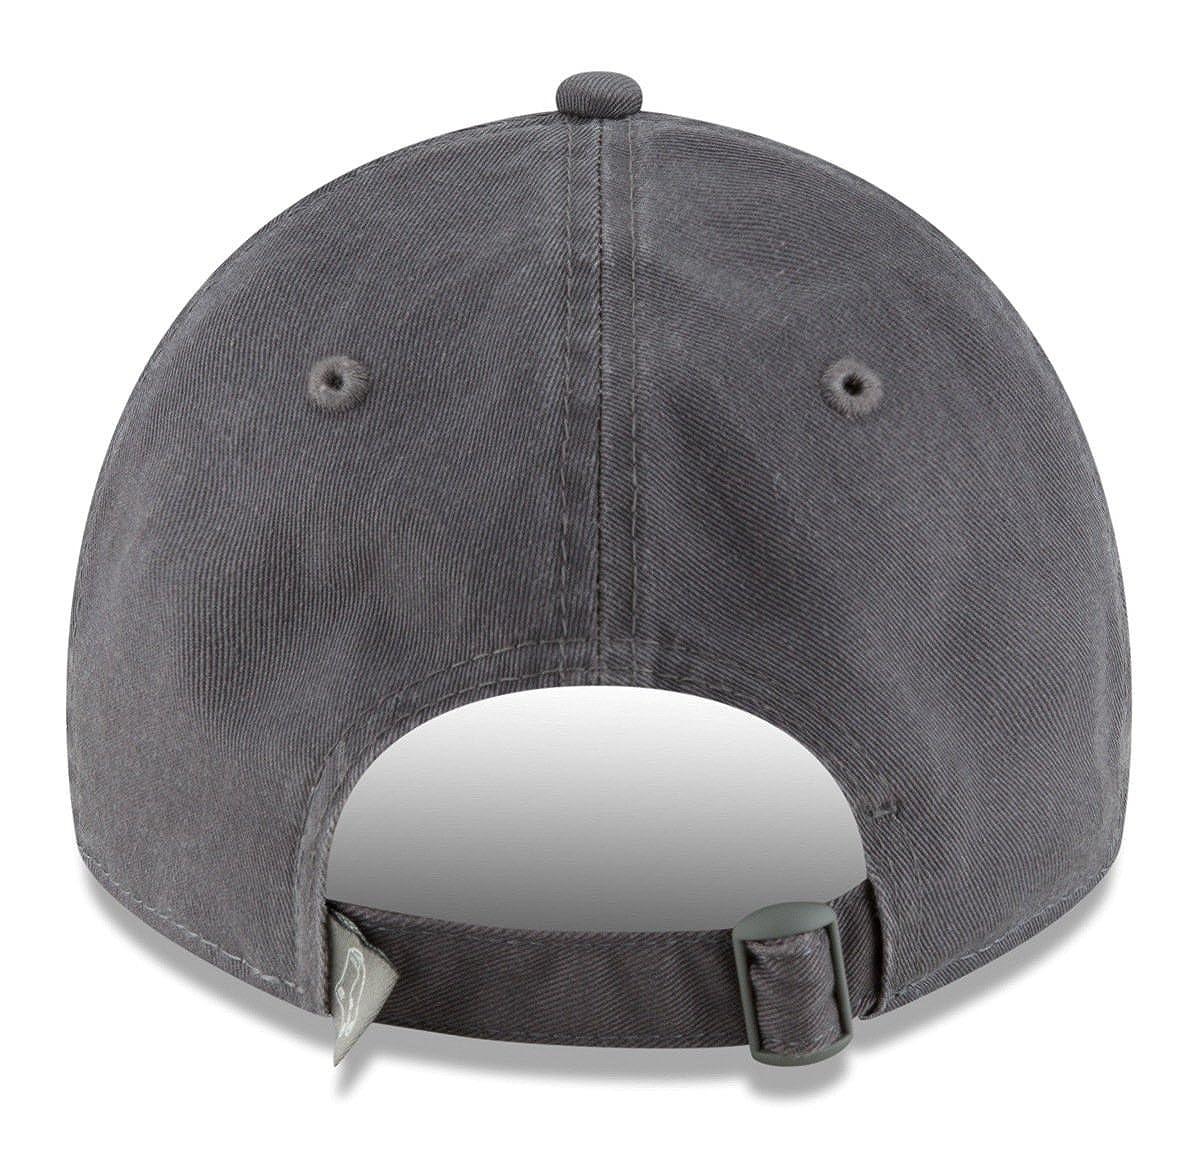 18b7e4610 Amazon.com : New Era Boston Red Sox MLB 9Twenty Classic Tonal Adjustable  Graphite Hat : Clothing